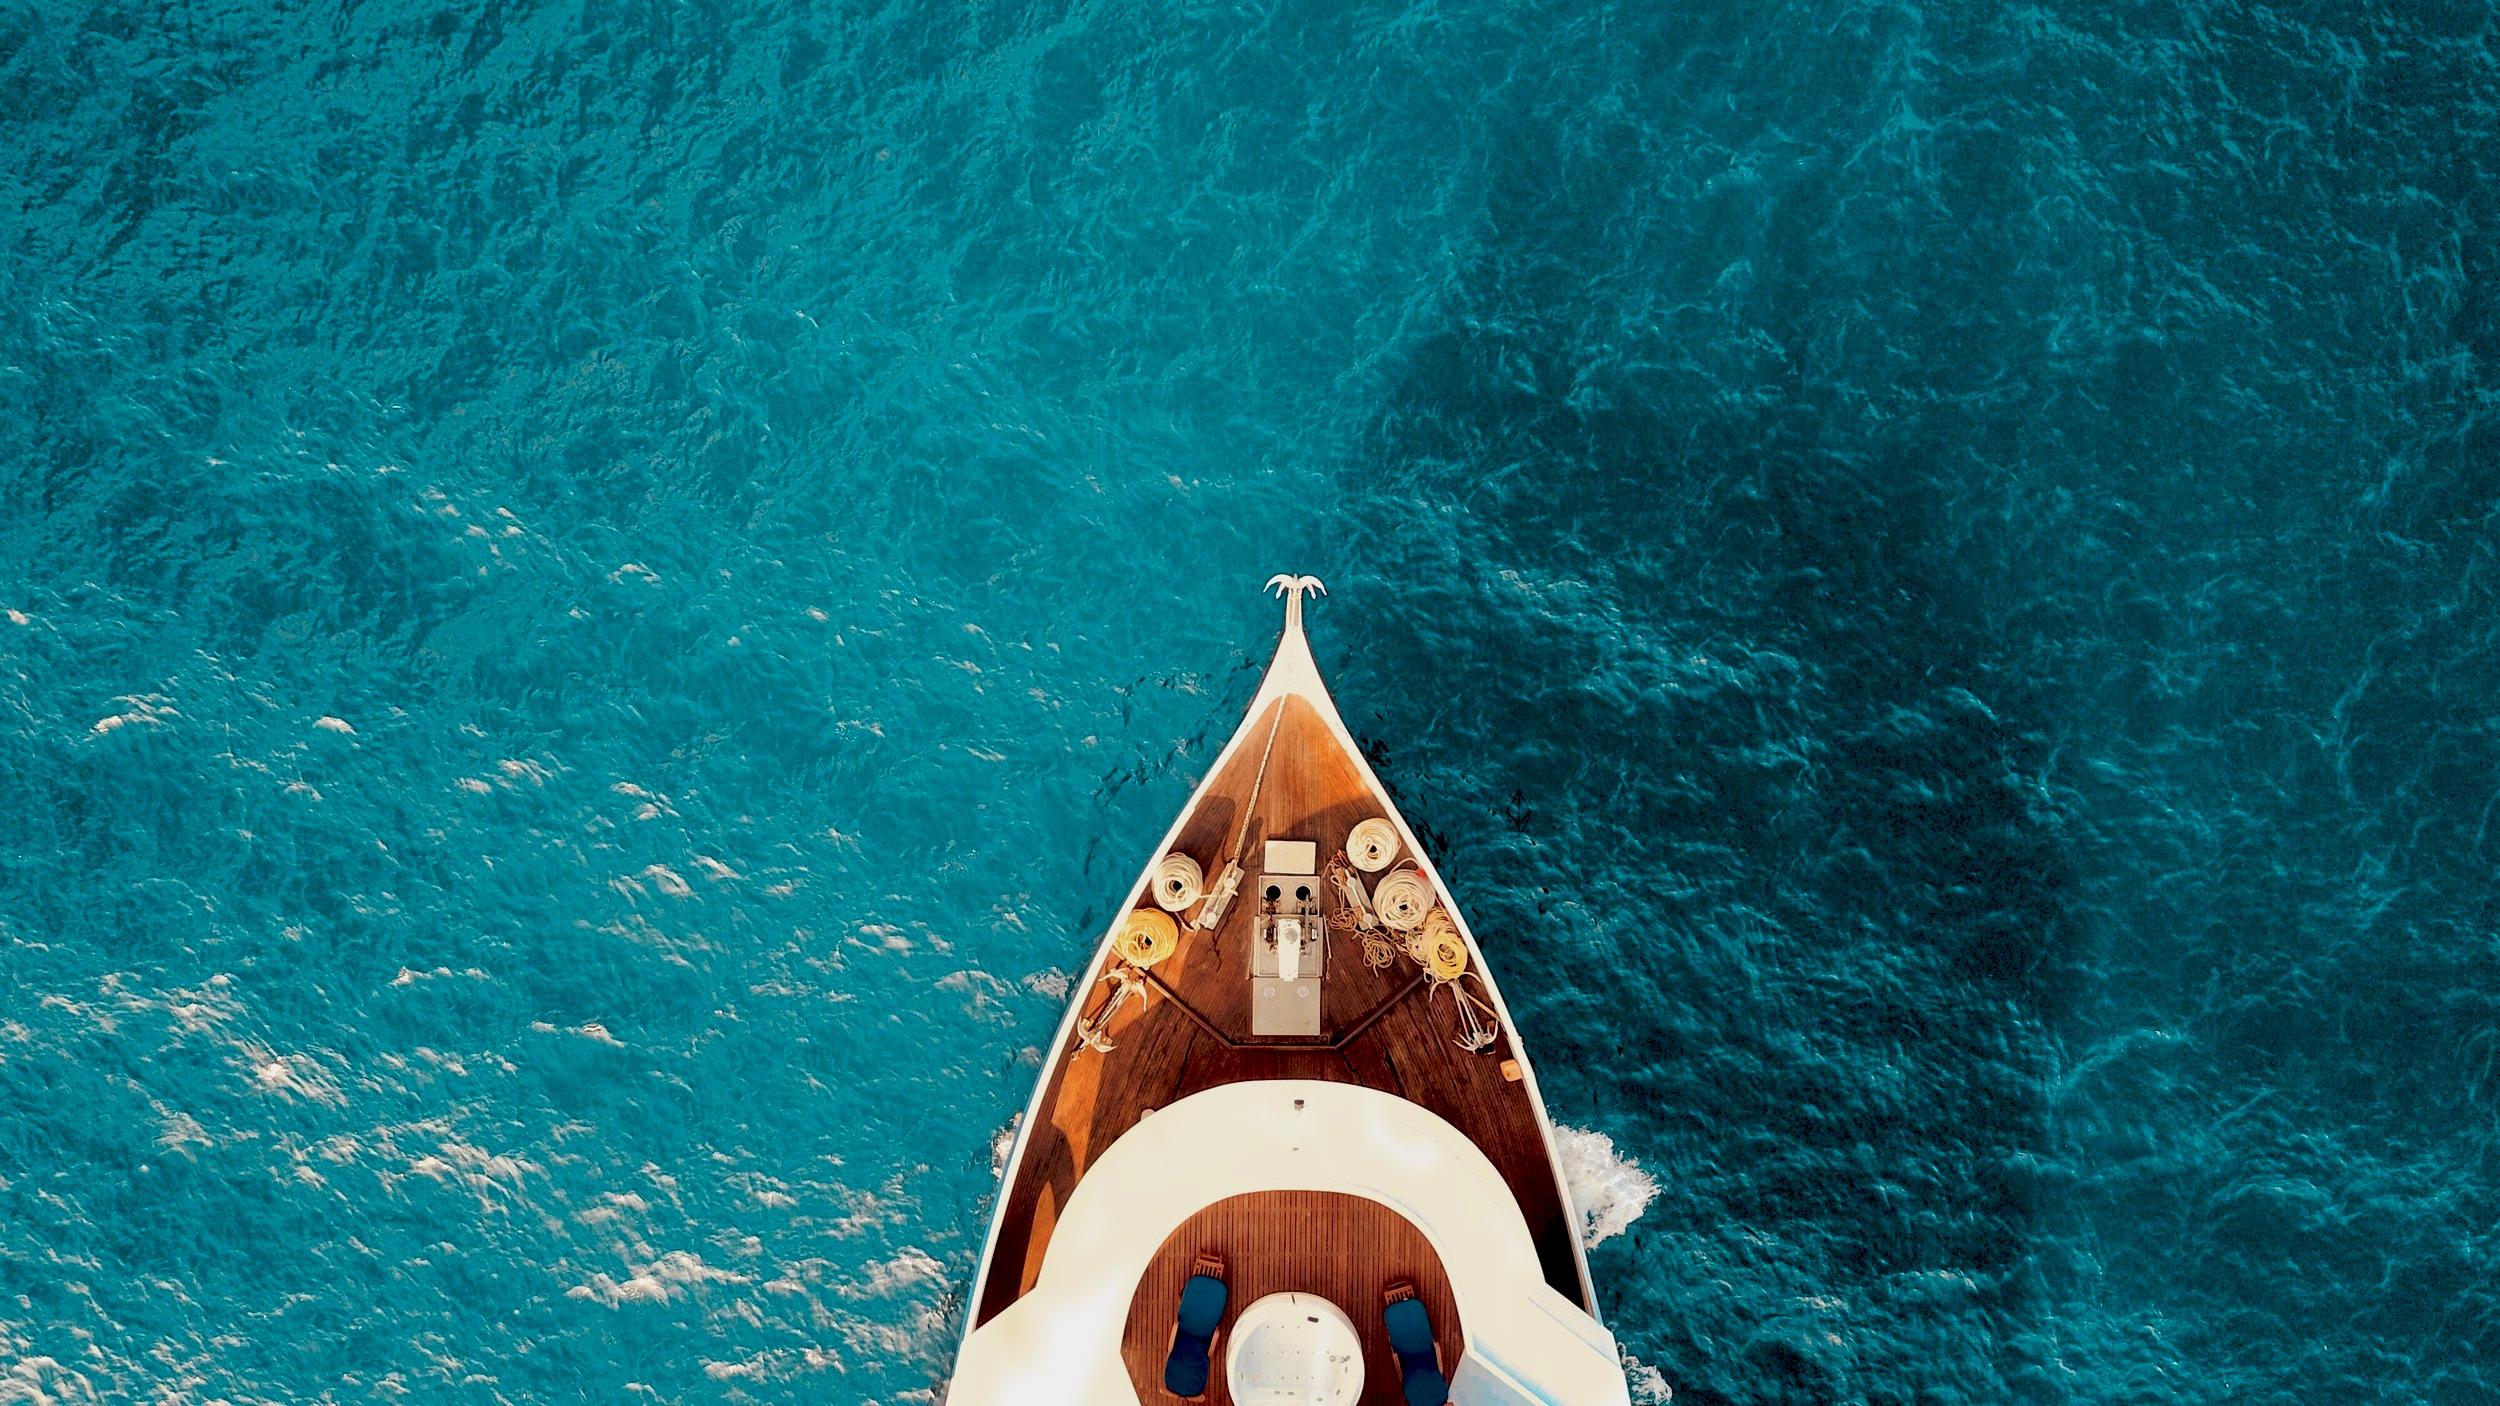 saturday - yachty like there's no tomorrow